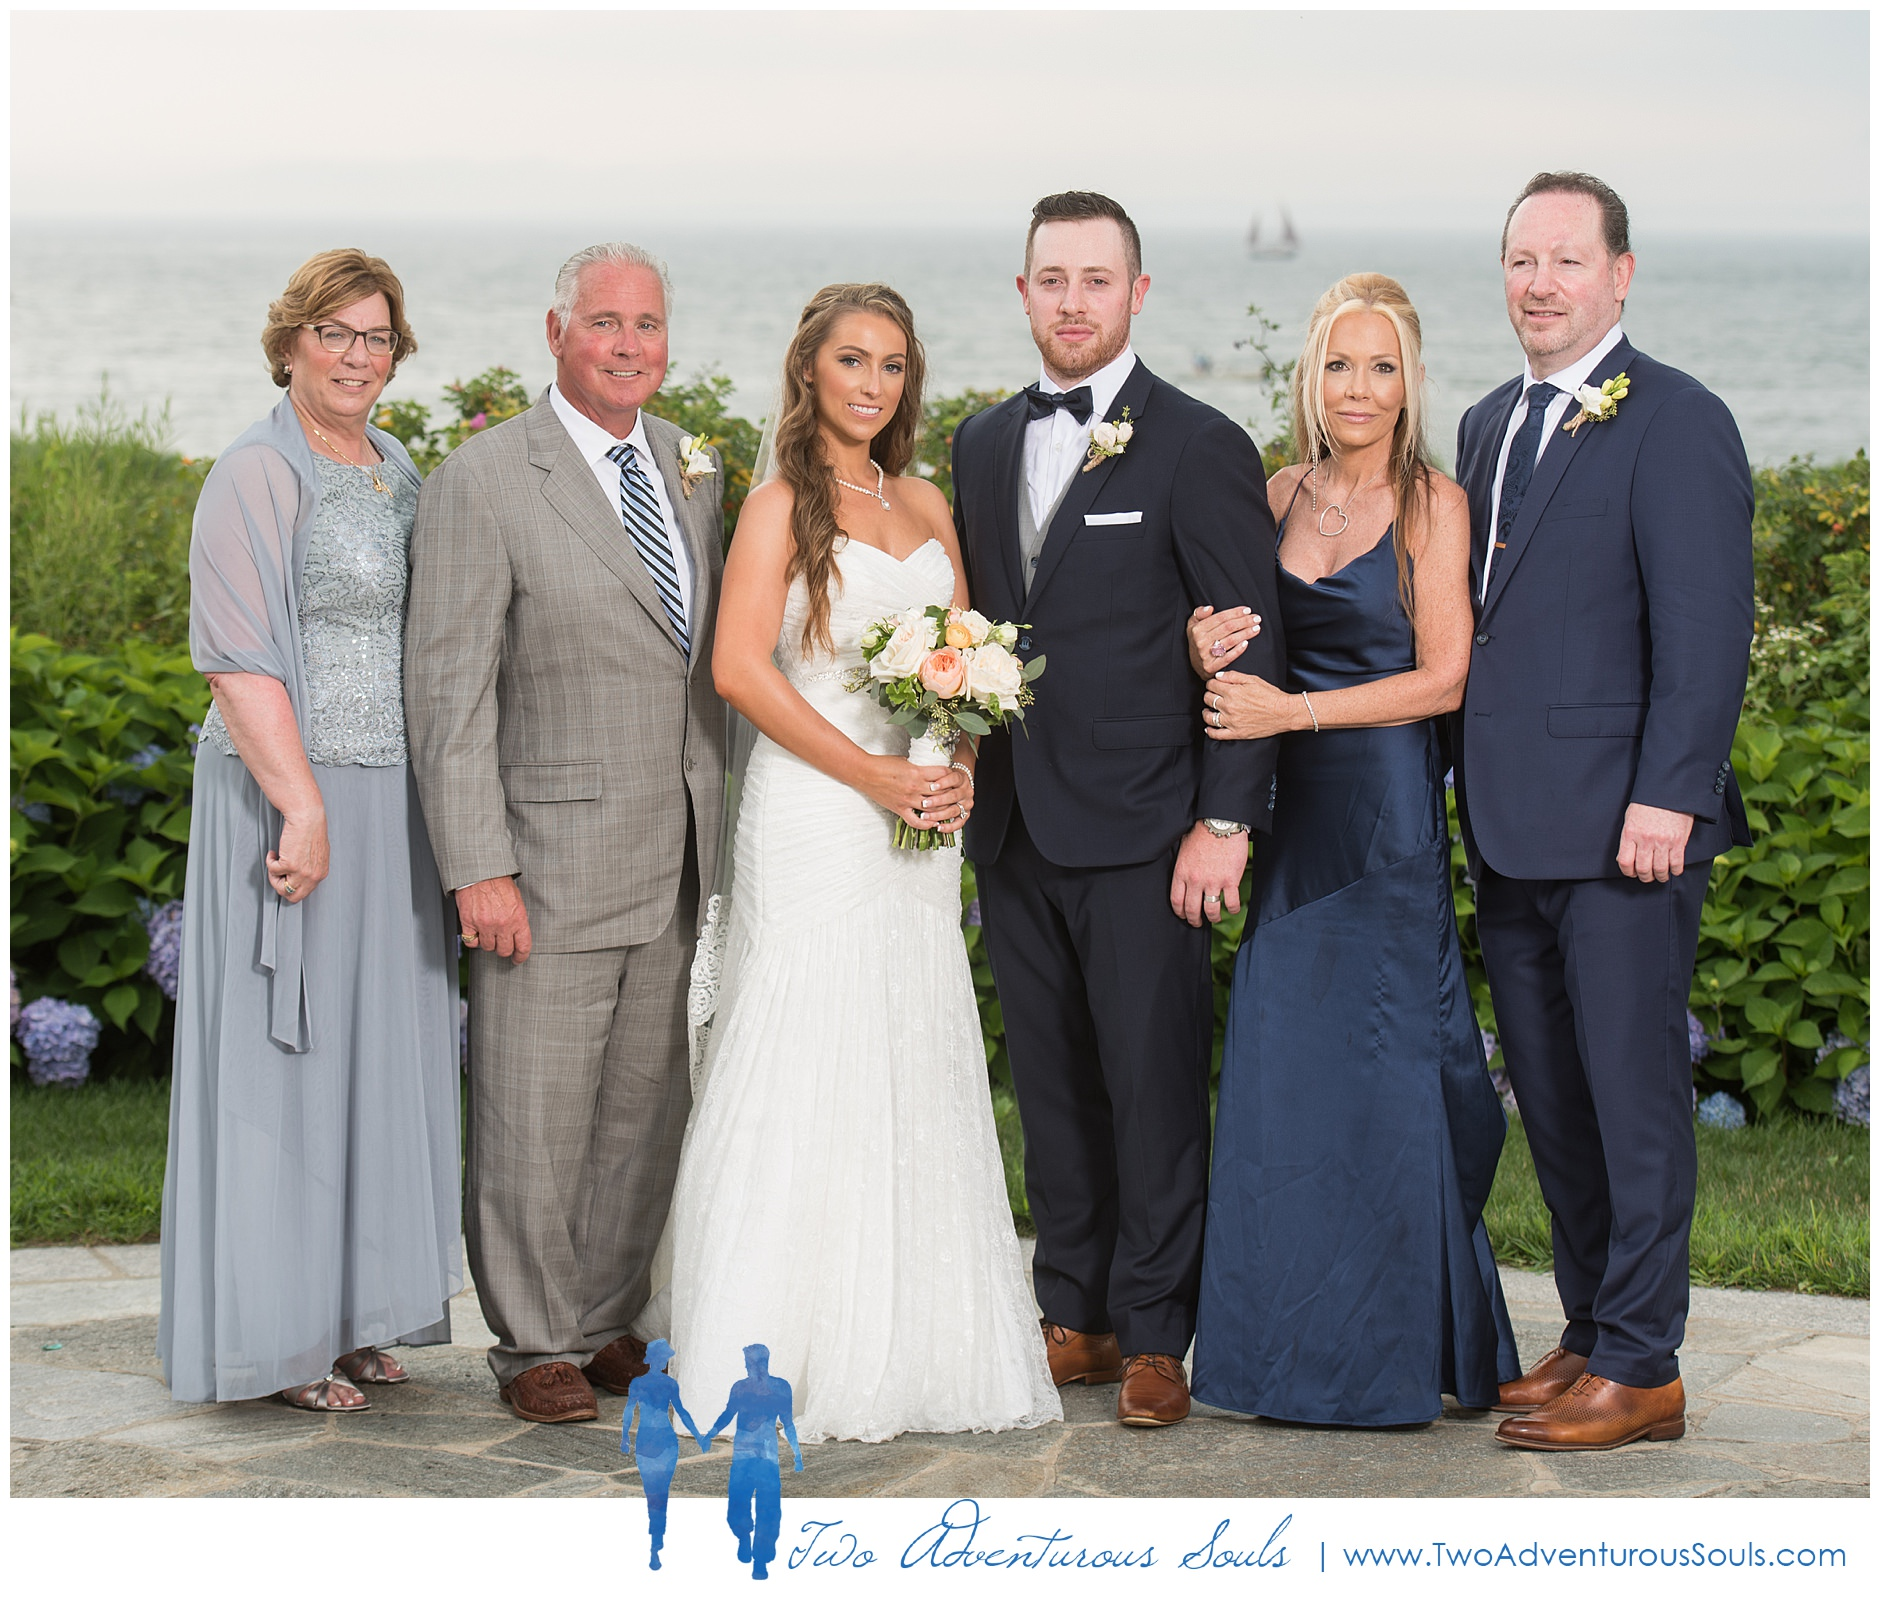 Wedding Day Family Portraits, Wedding Planning, Maine Wedding Photographers, Two Adventurous Souls_WDFPP_0001.jpg